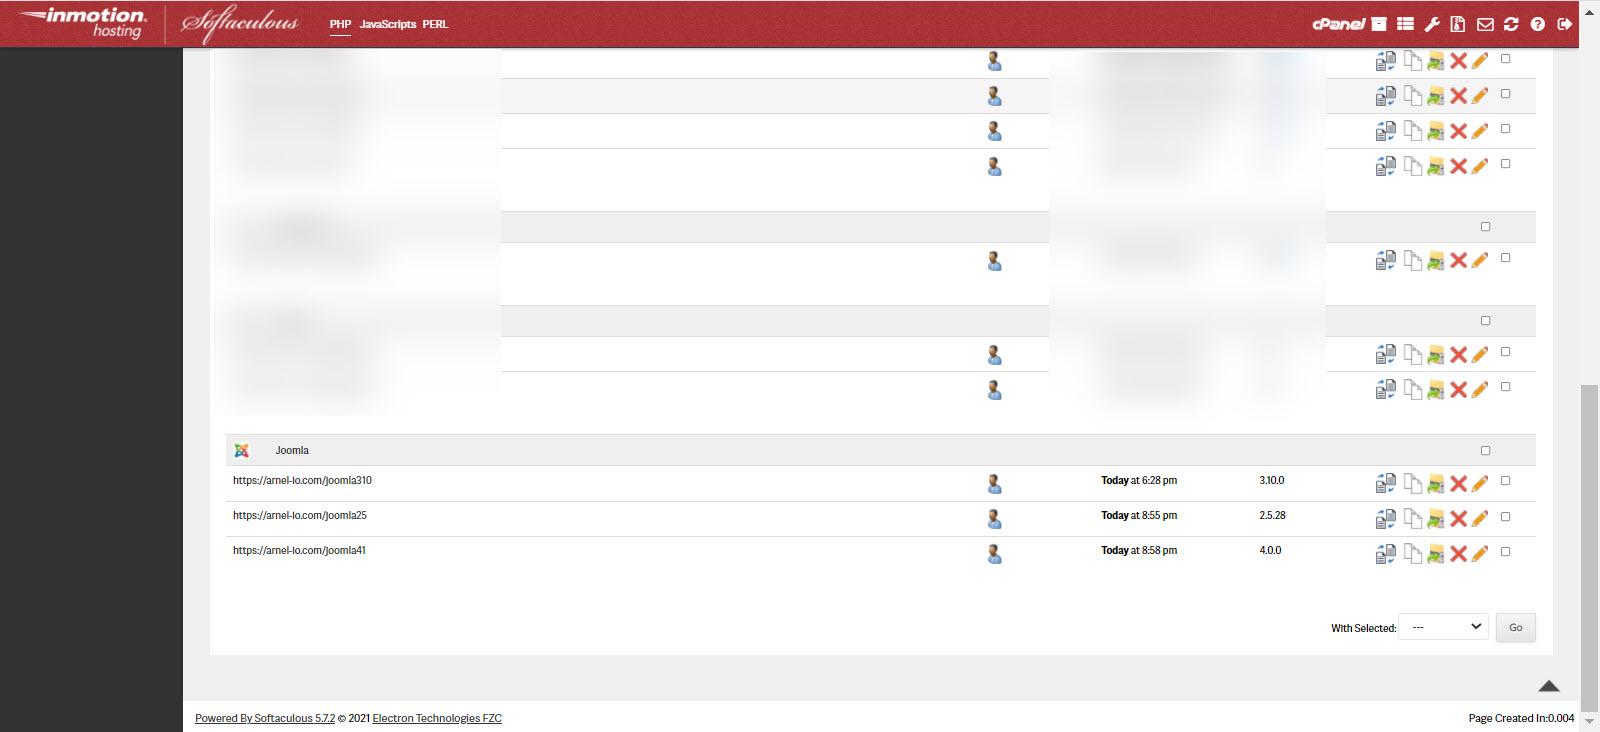 List of all installs in Joomla